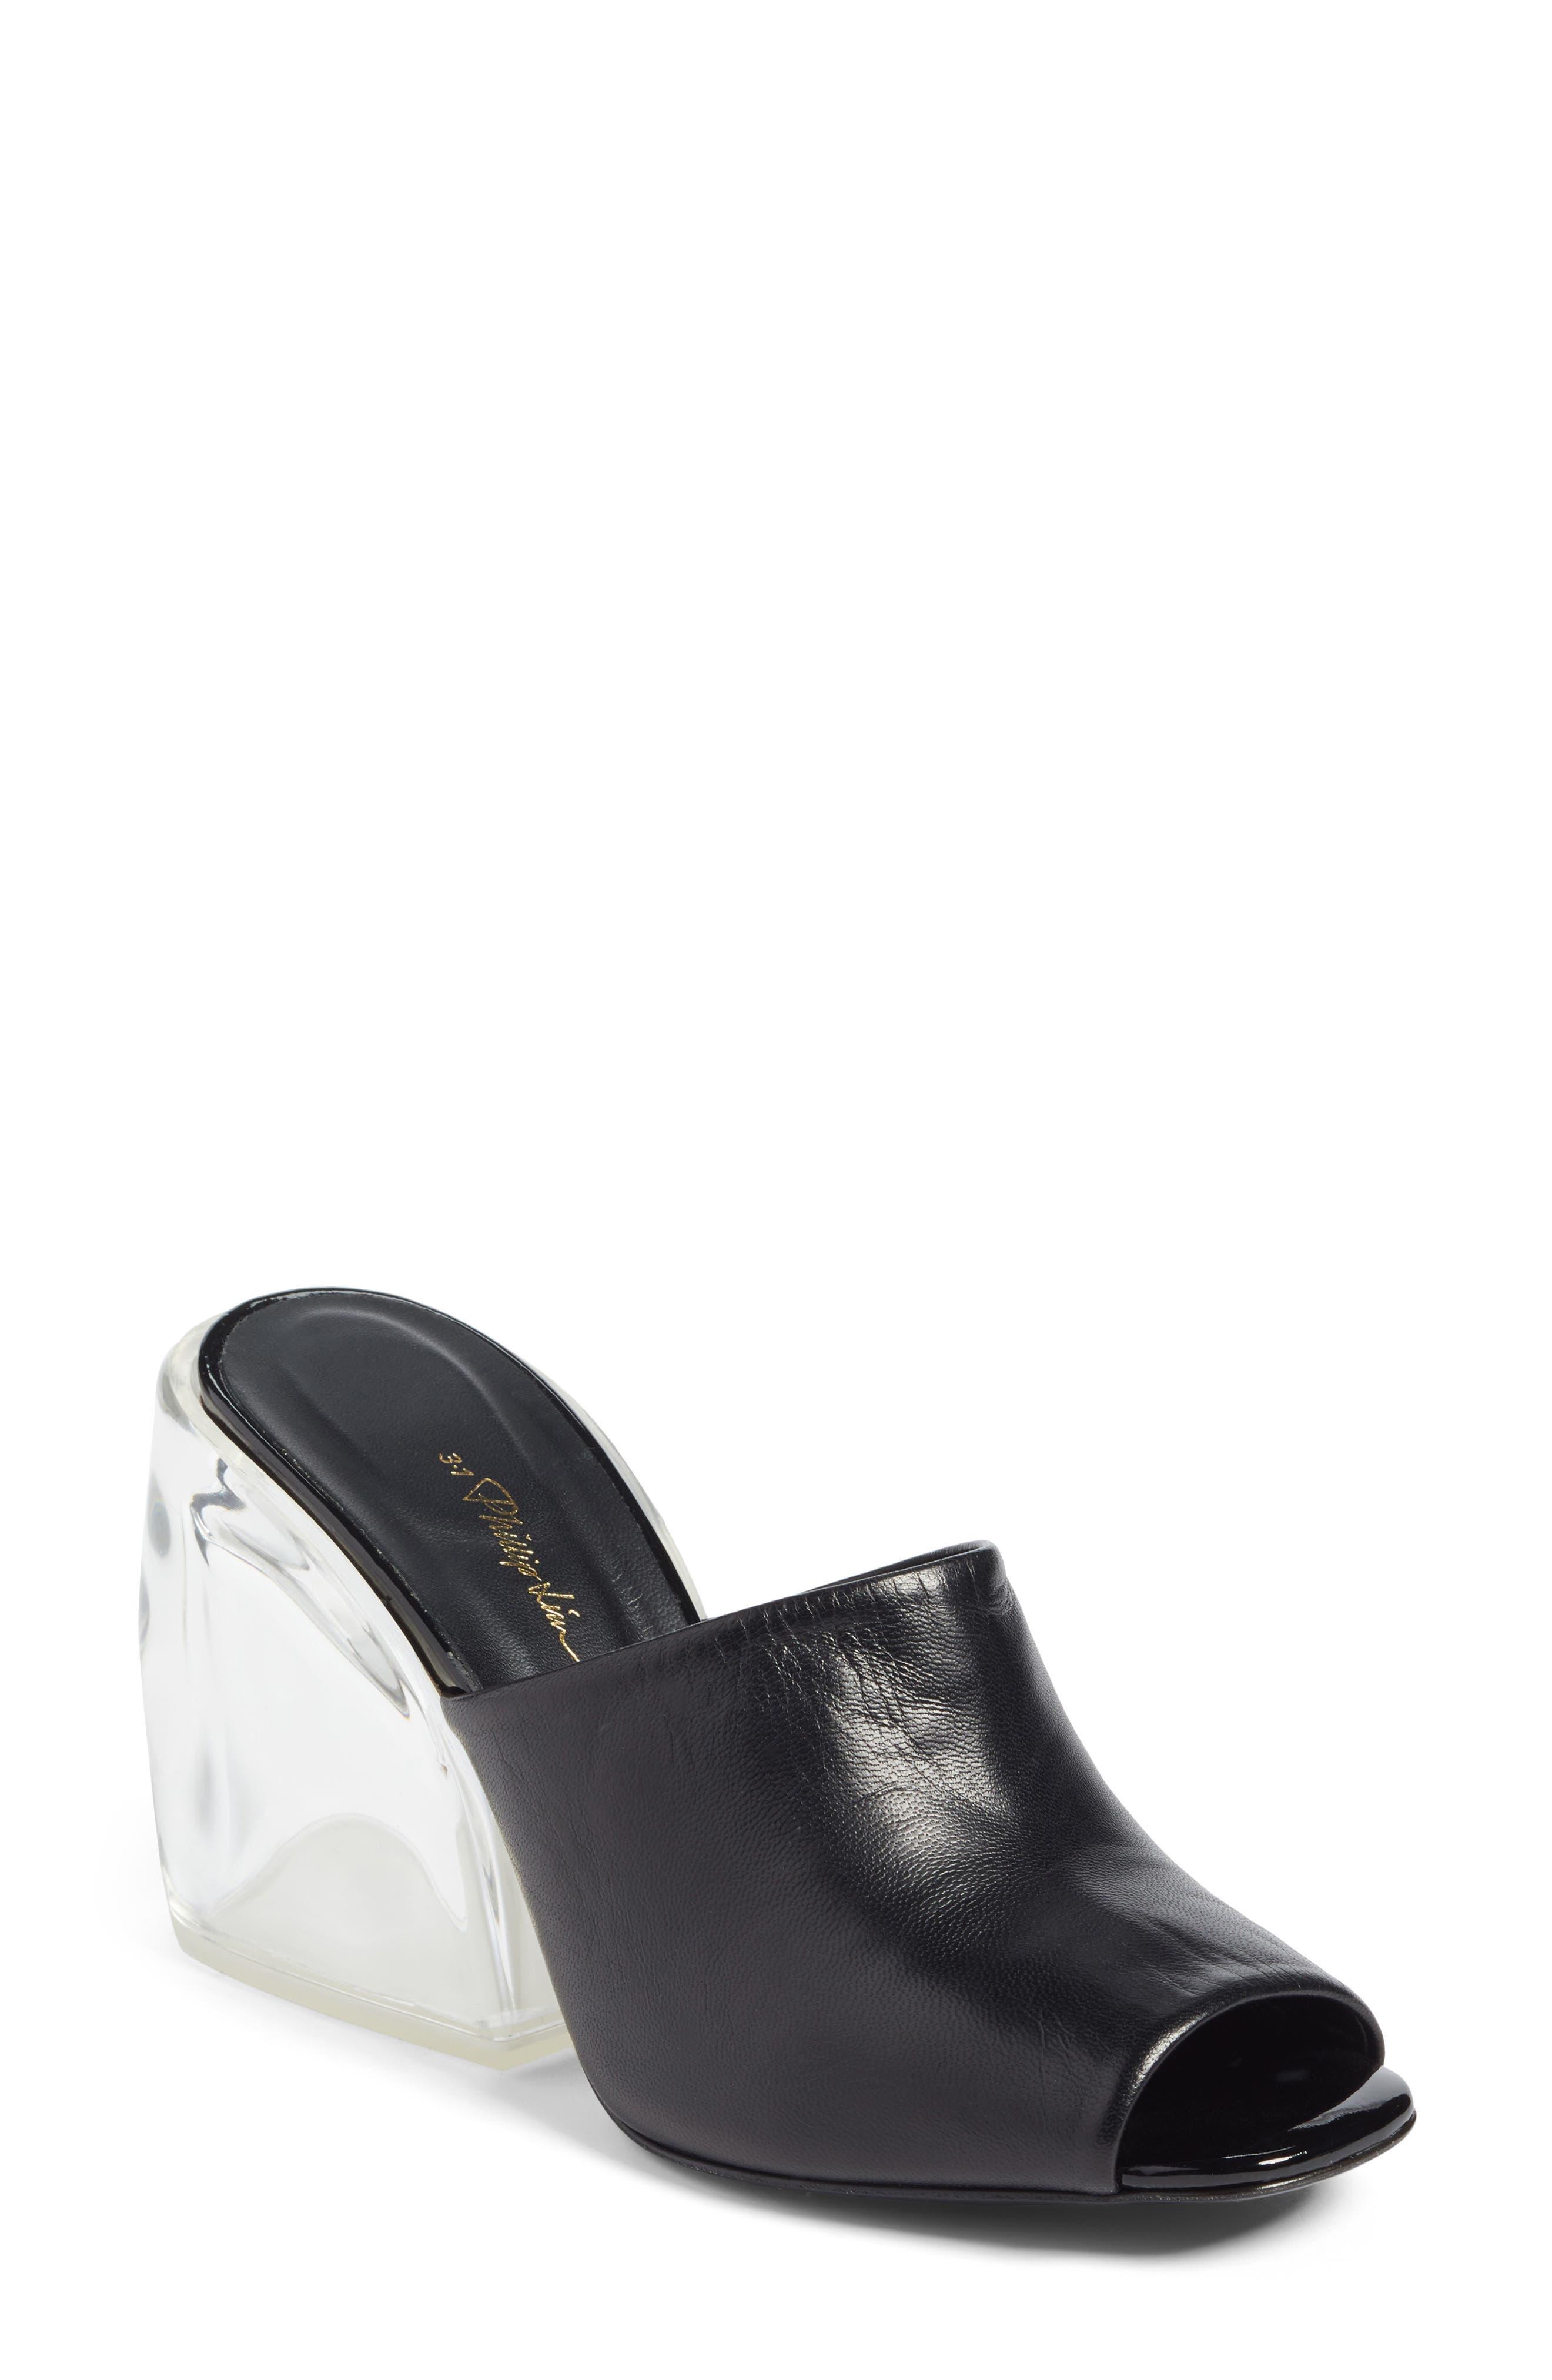 Transparent Wedge Slide Sandal,                             Main thumbnail 1, color,                             Black